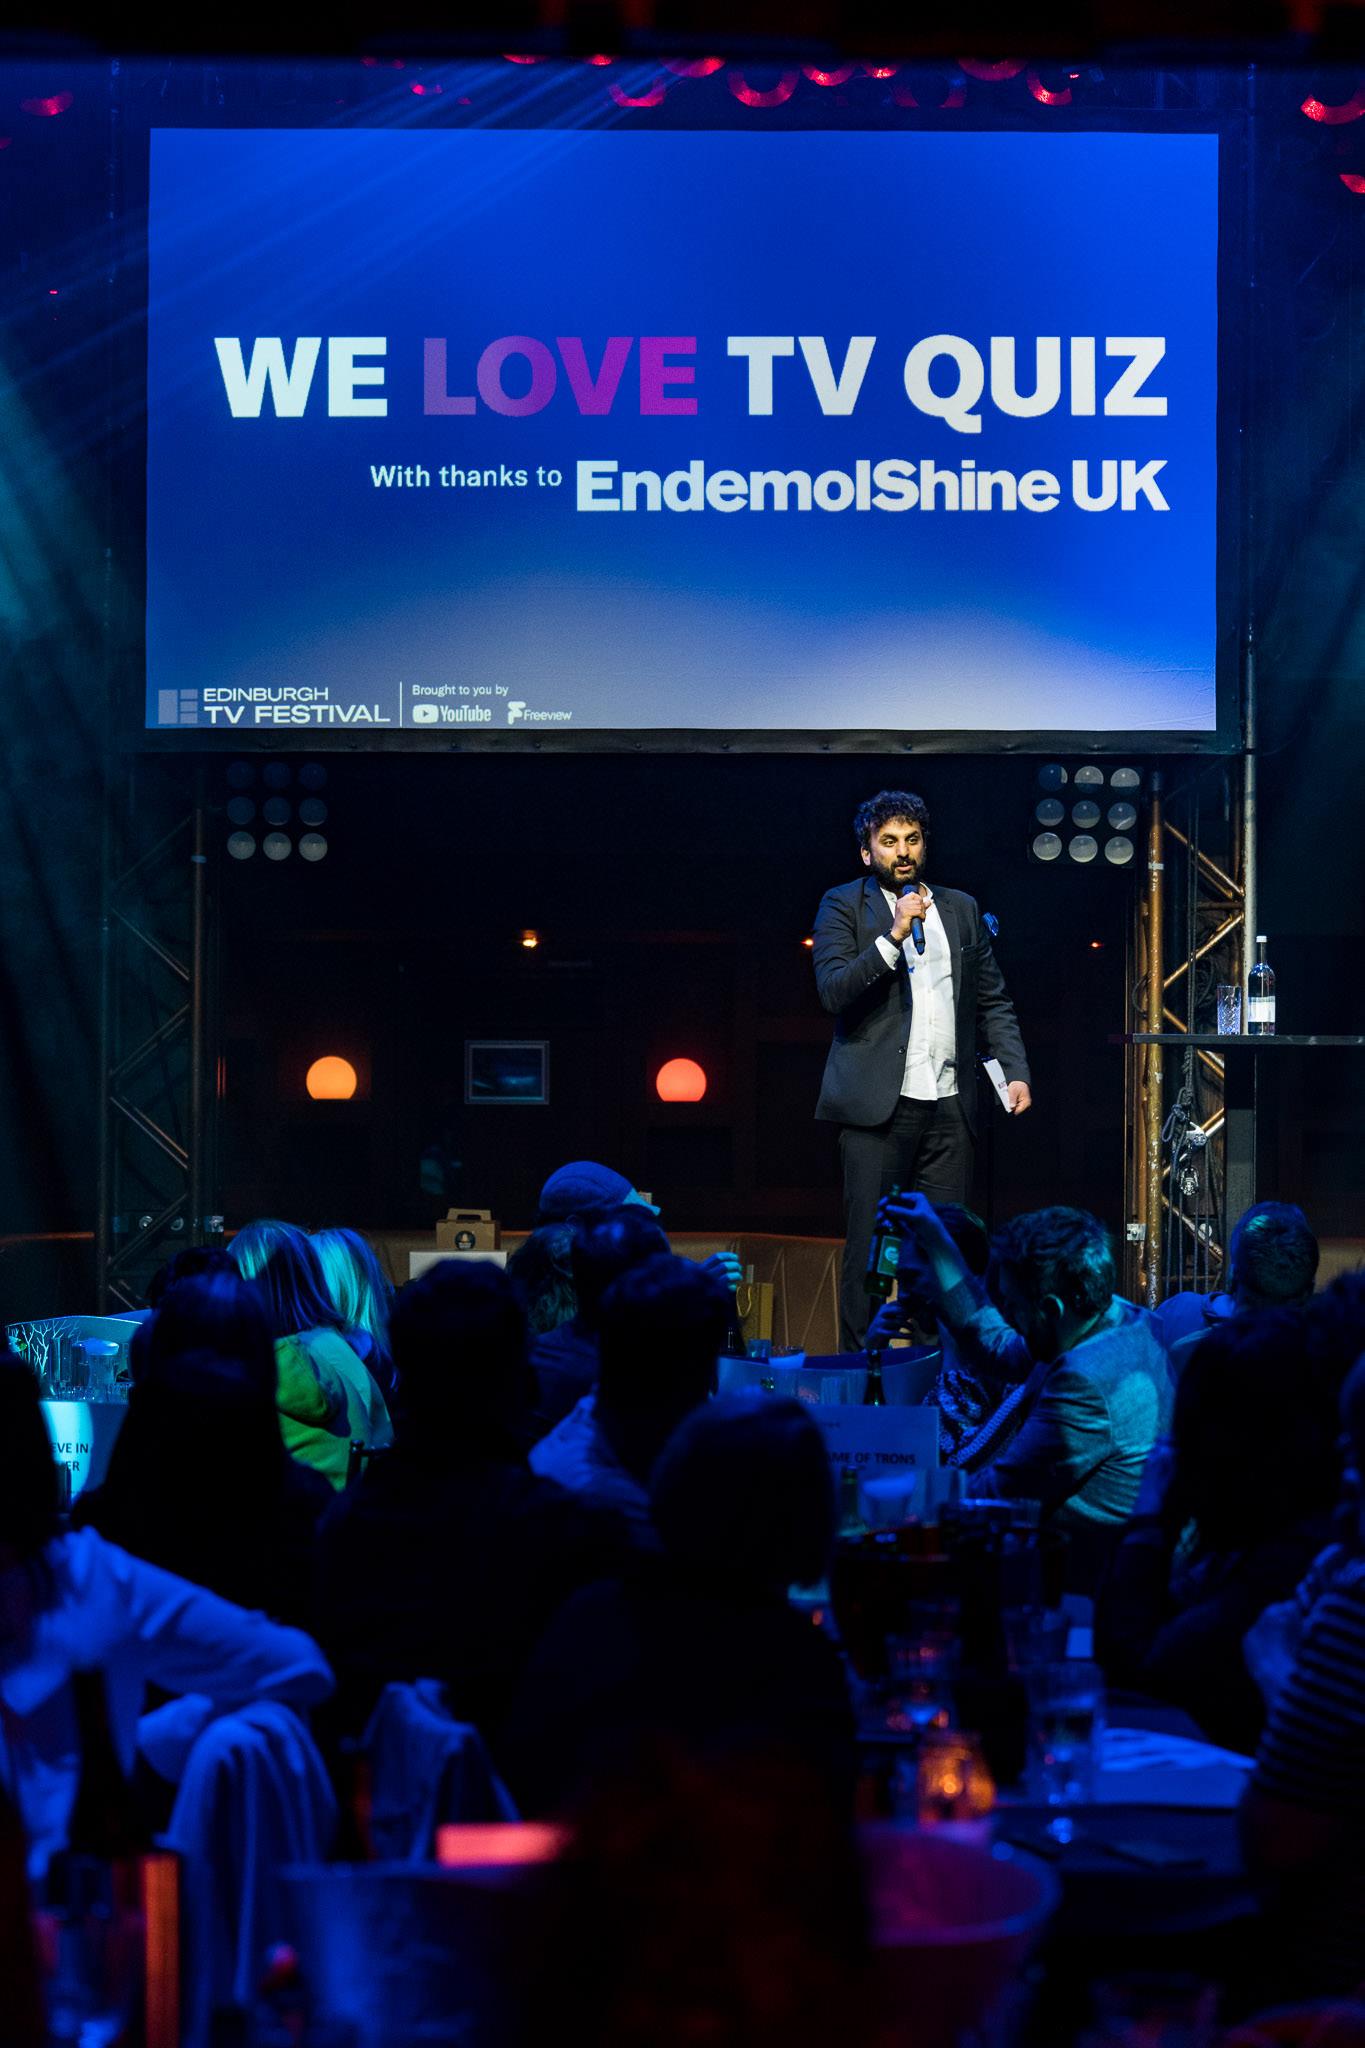 Edinburgh TV Festival's We Love TV Quiz at Proud Embankment